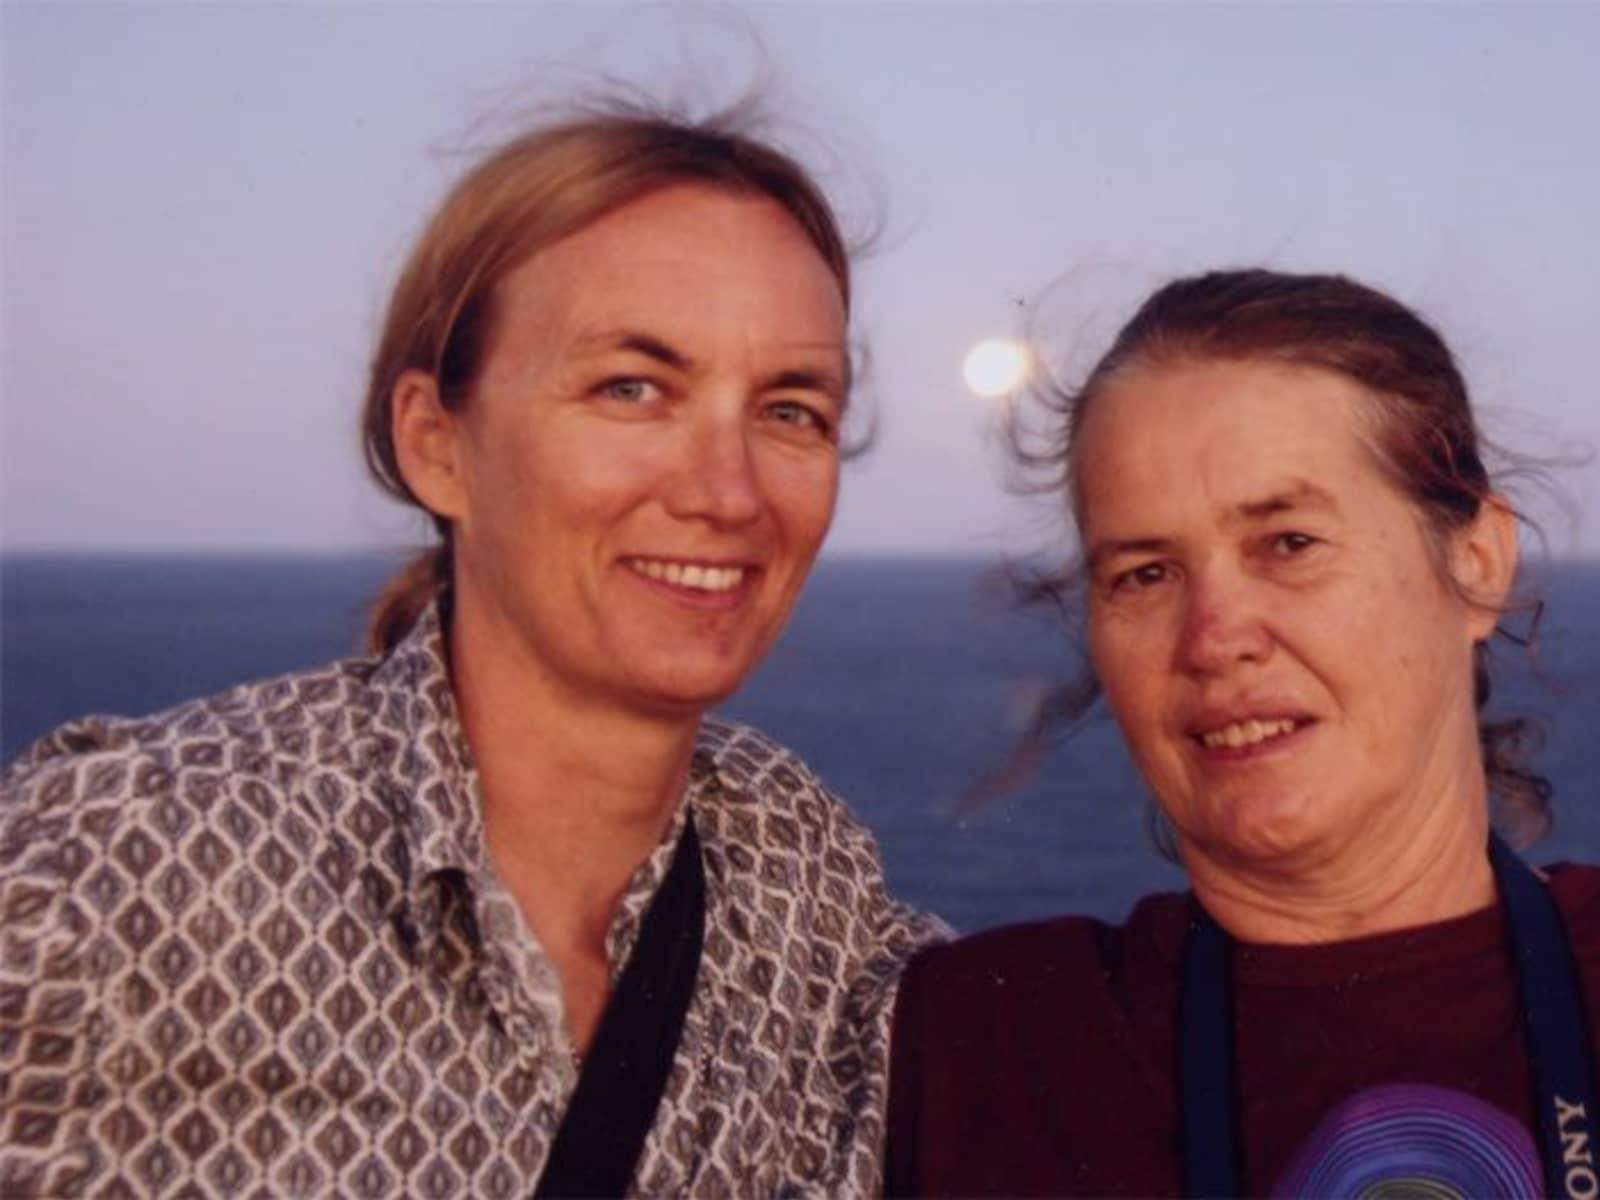 Asa & Hilary from Byron Bay, New South Wales, Australia